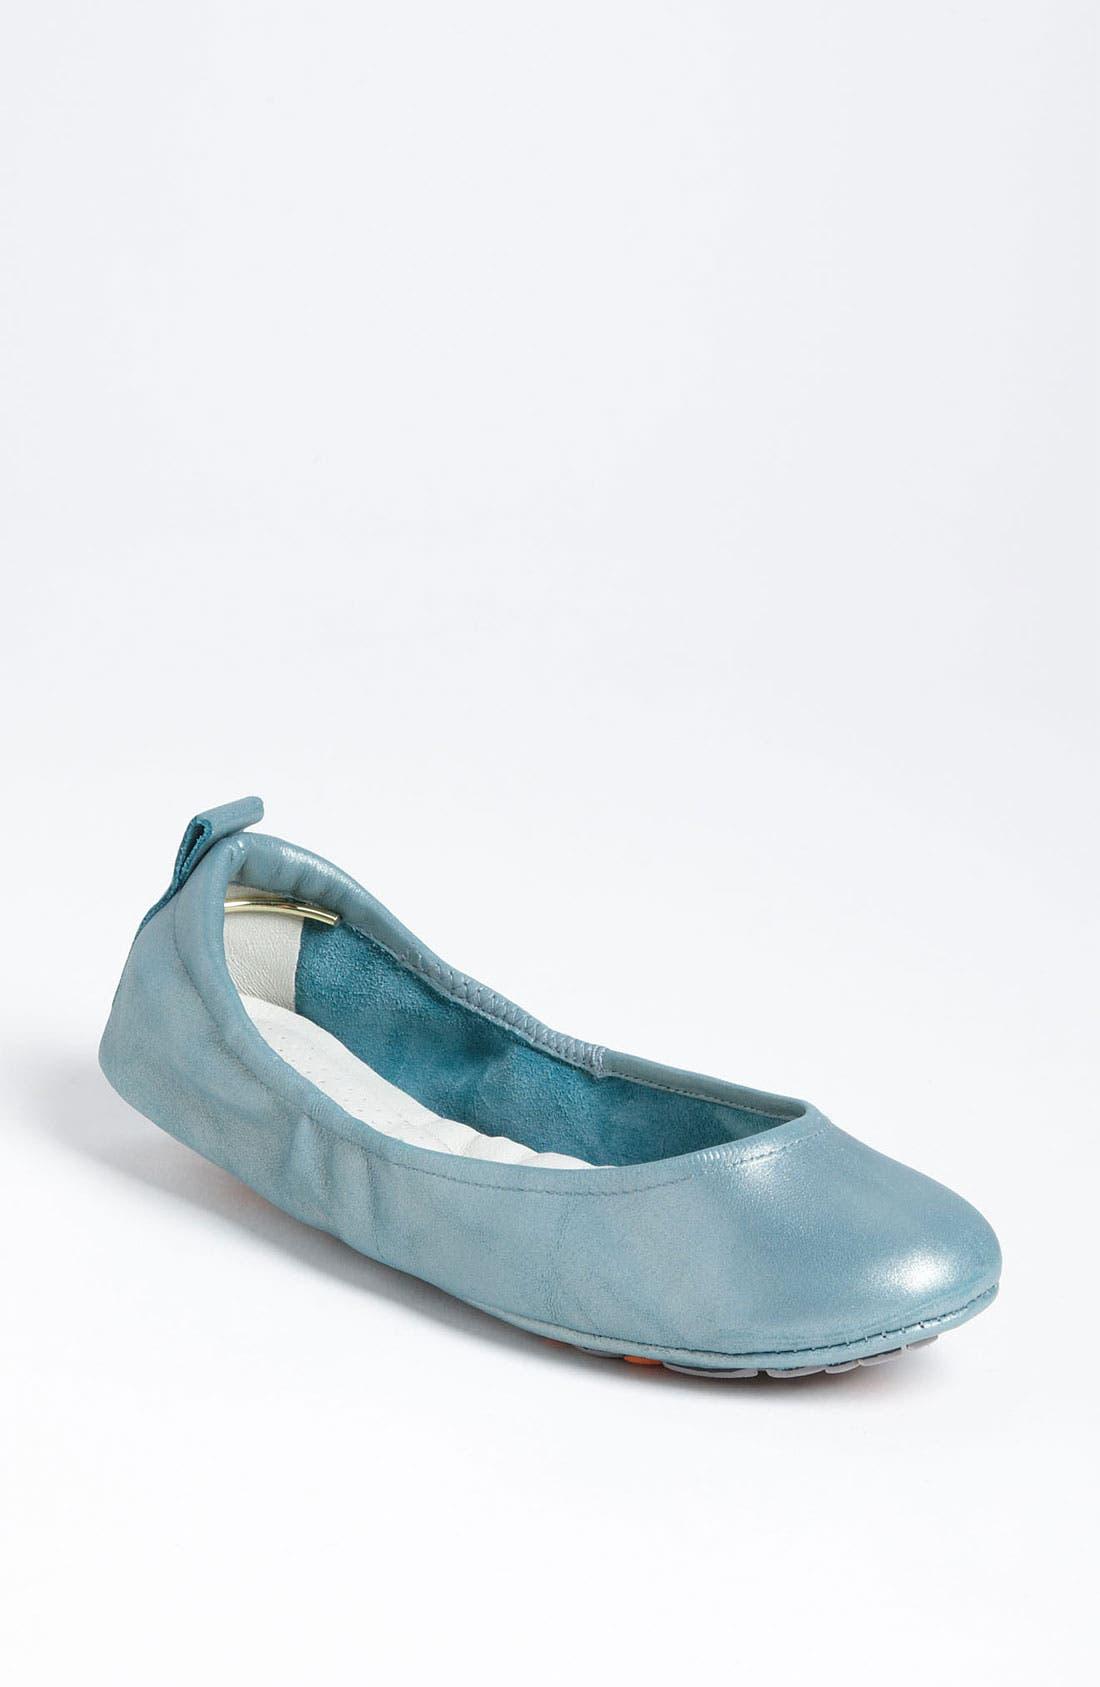 Main Image - Acorn 'Via' Ballet Flat (Online Only)